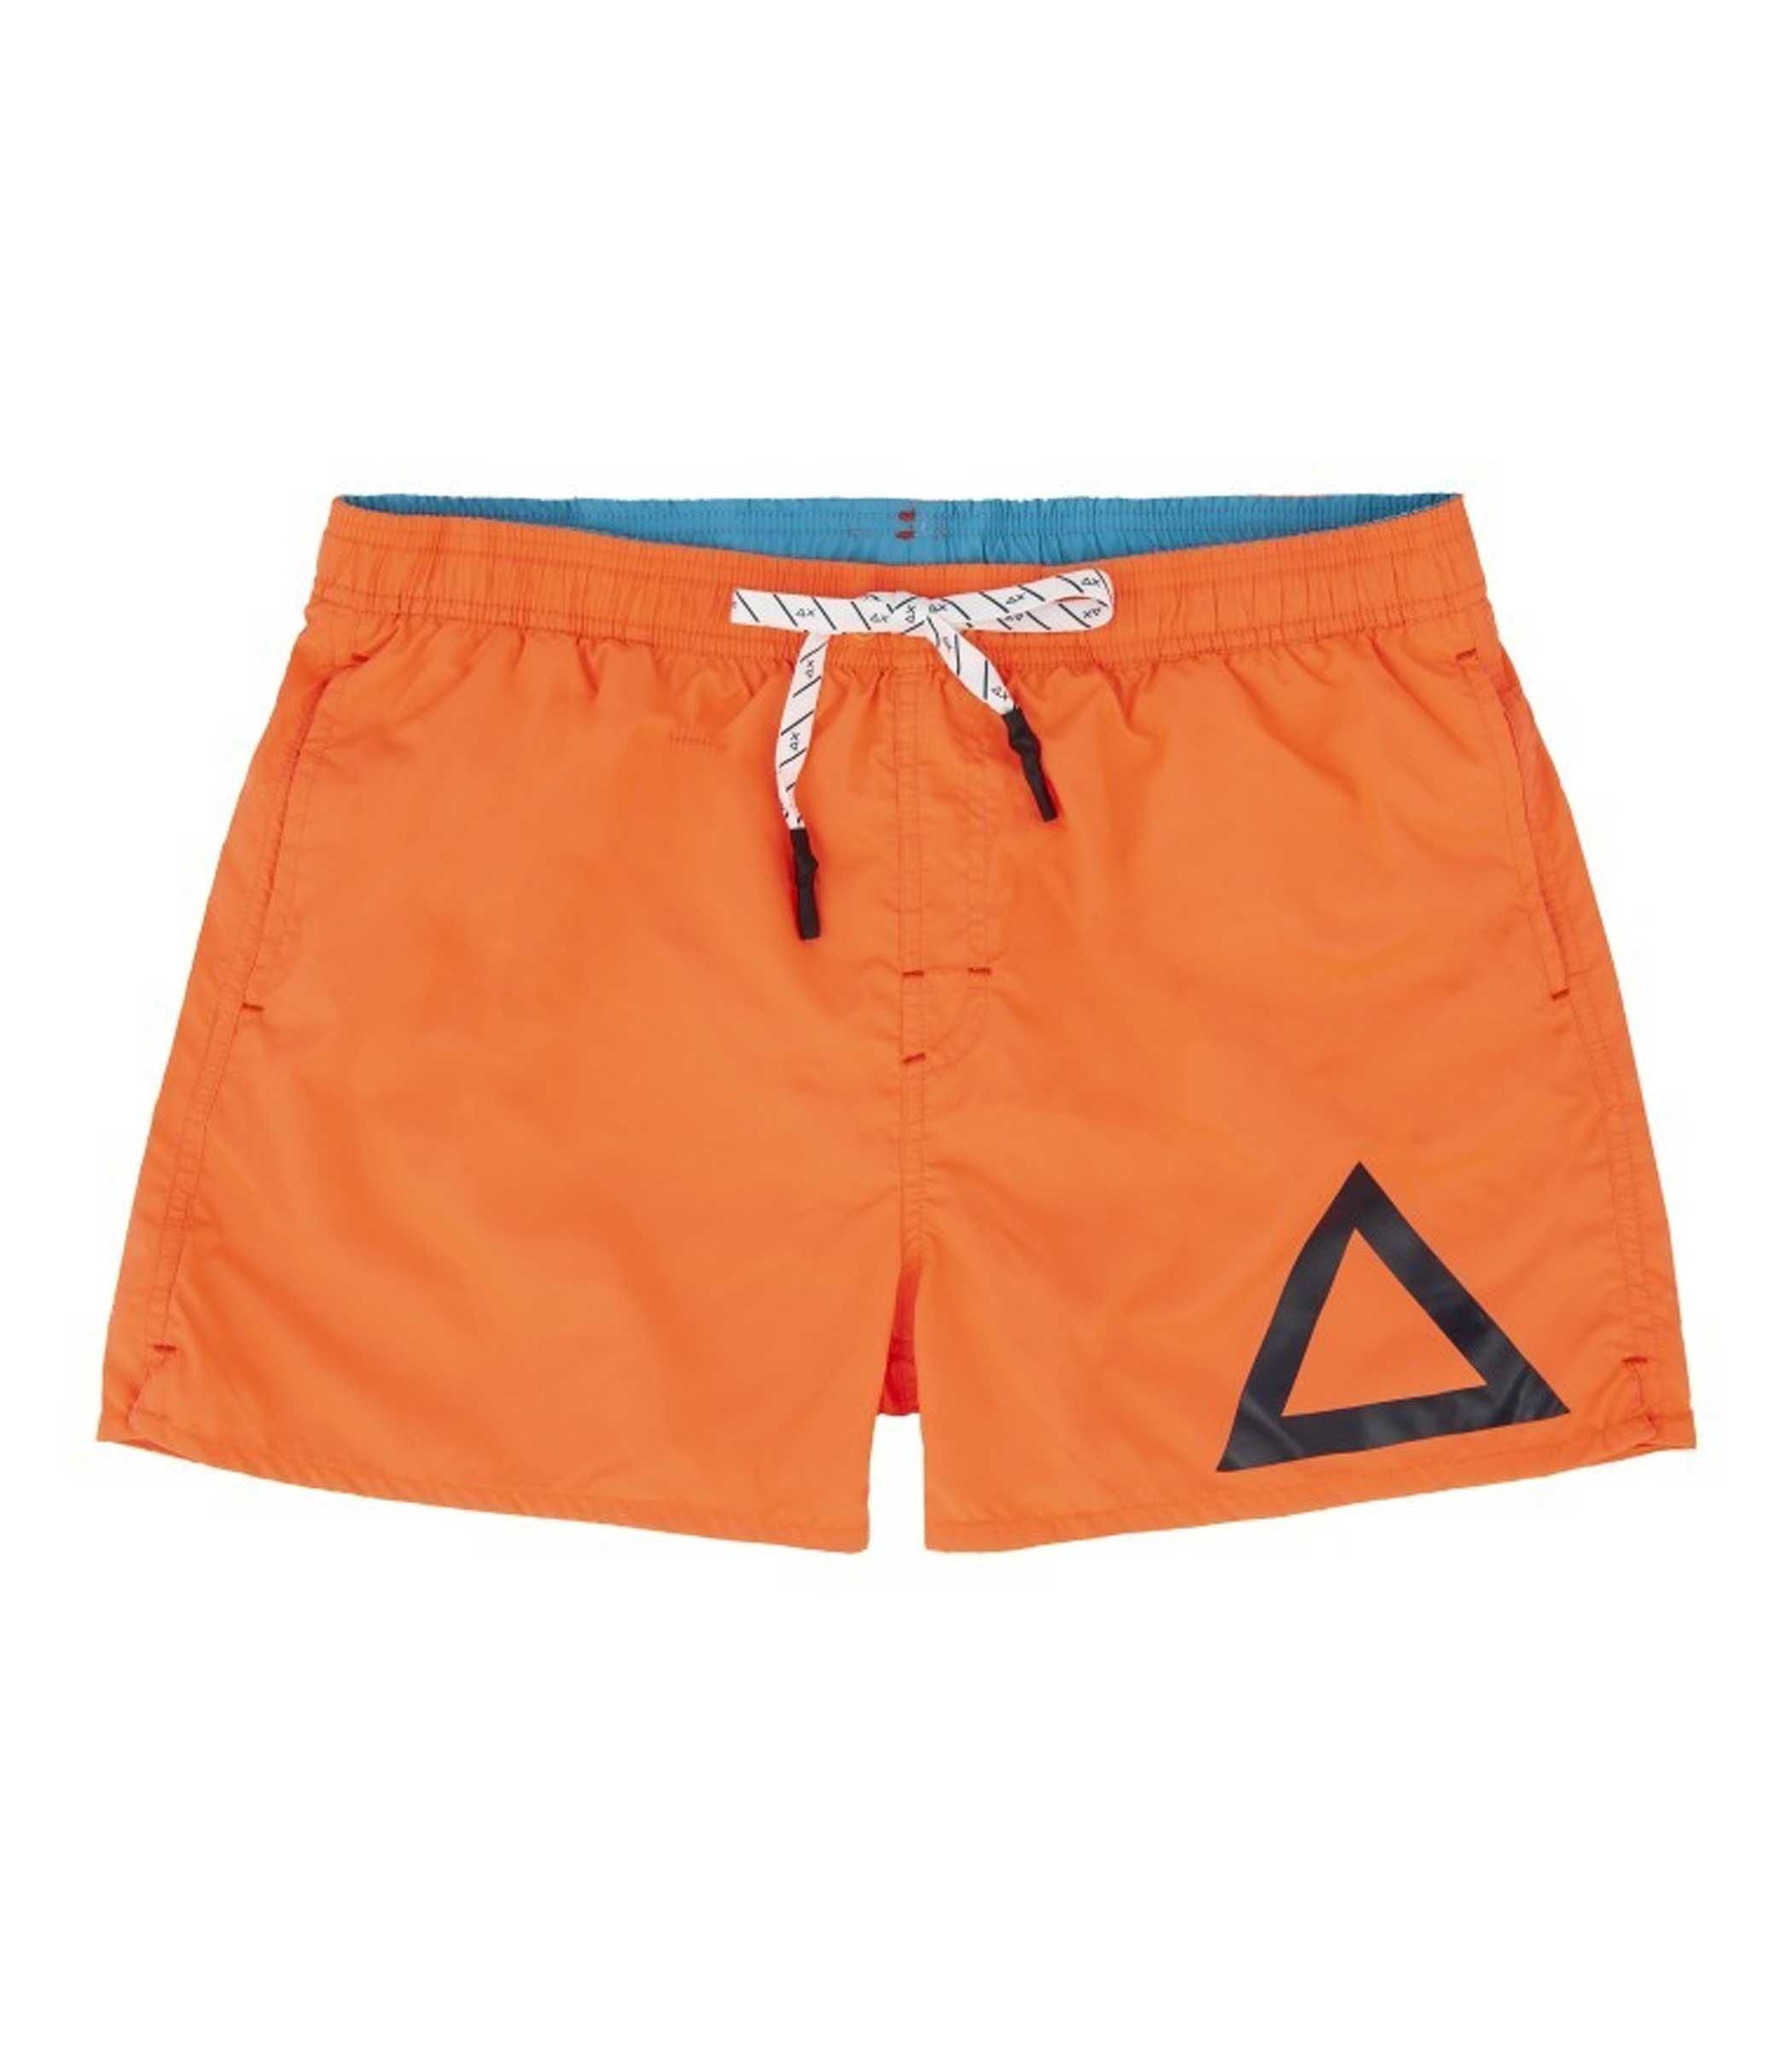 b604c168c4 Shorts Costume da bagno SUN68 con stampa da uomo rif. H19102